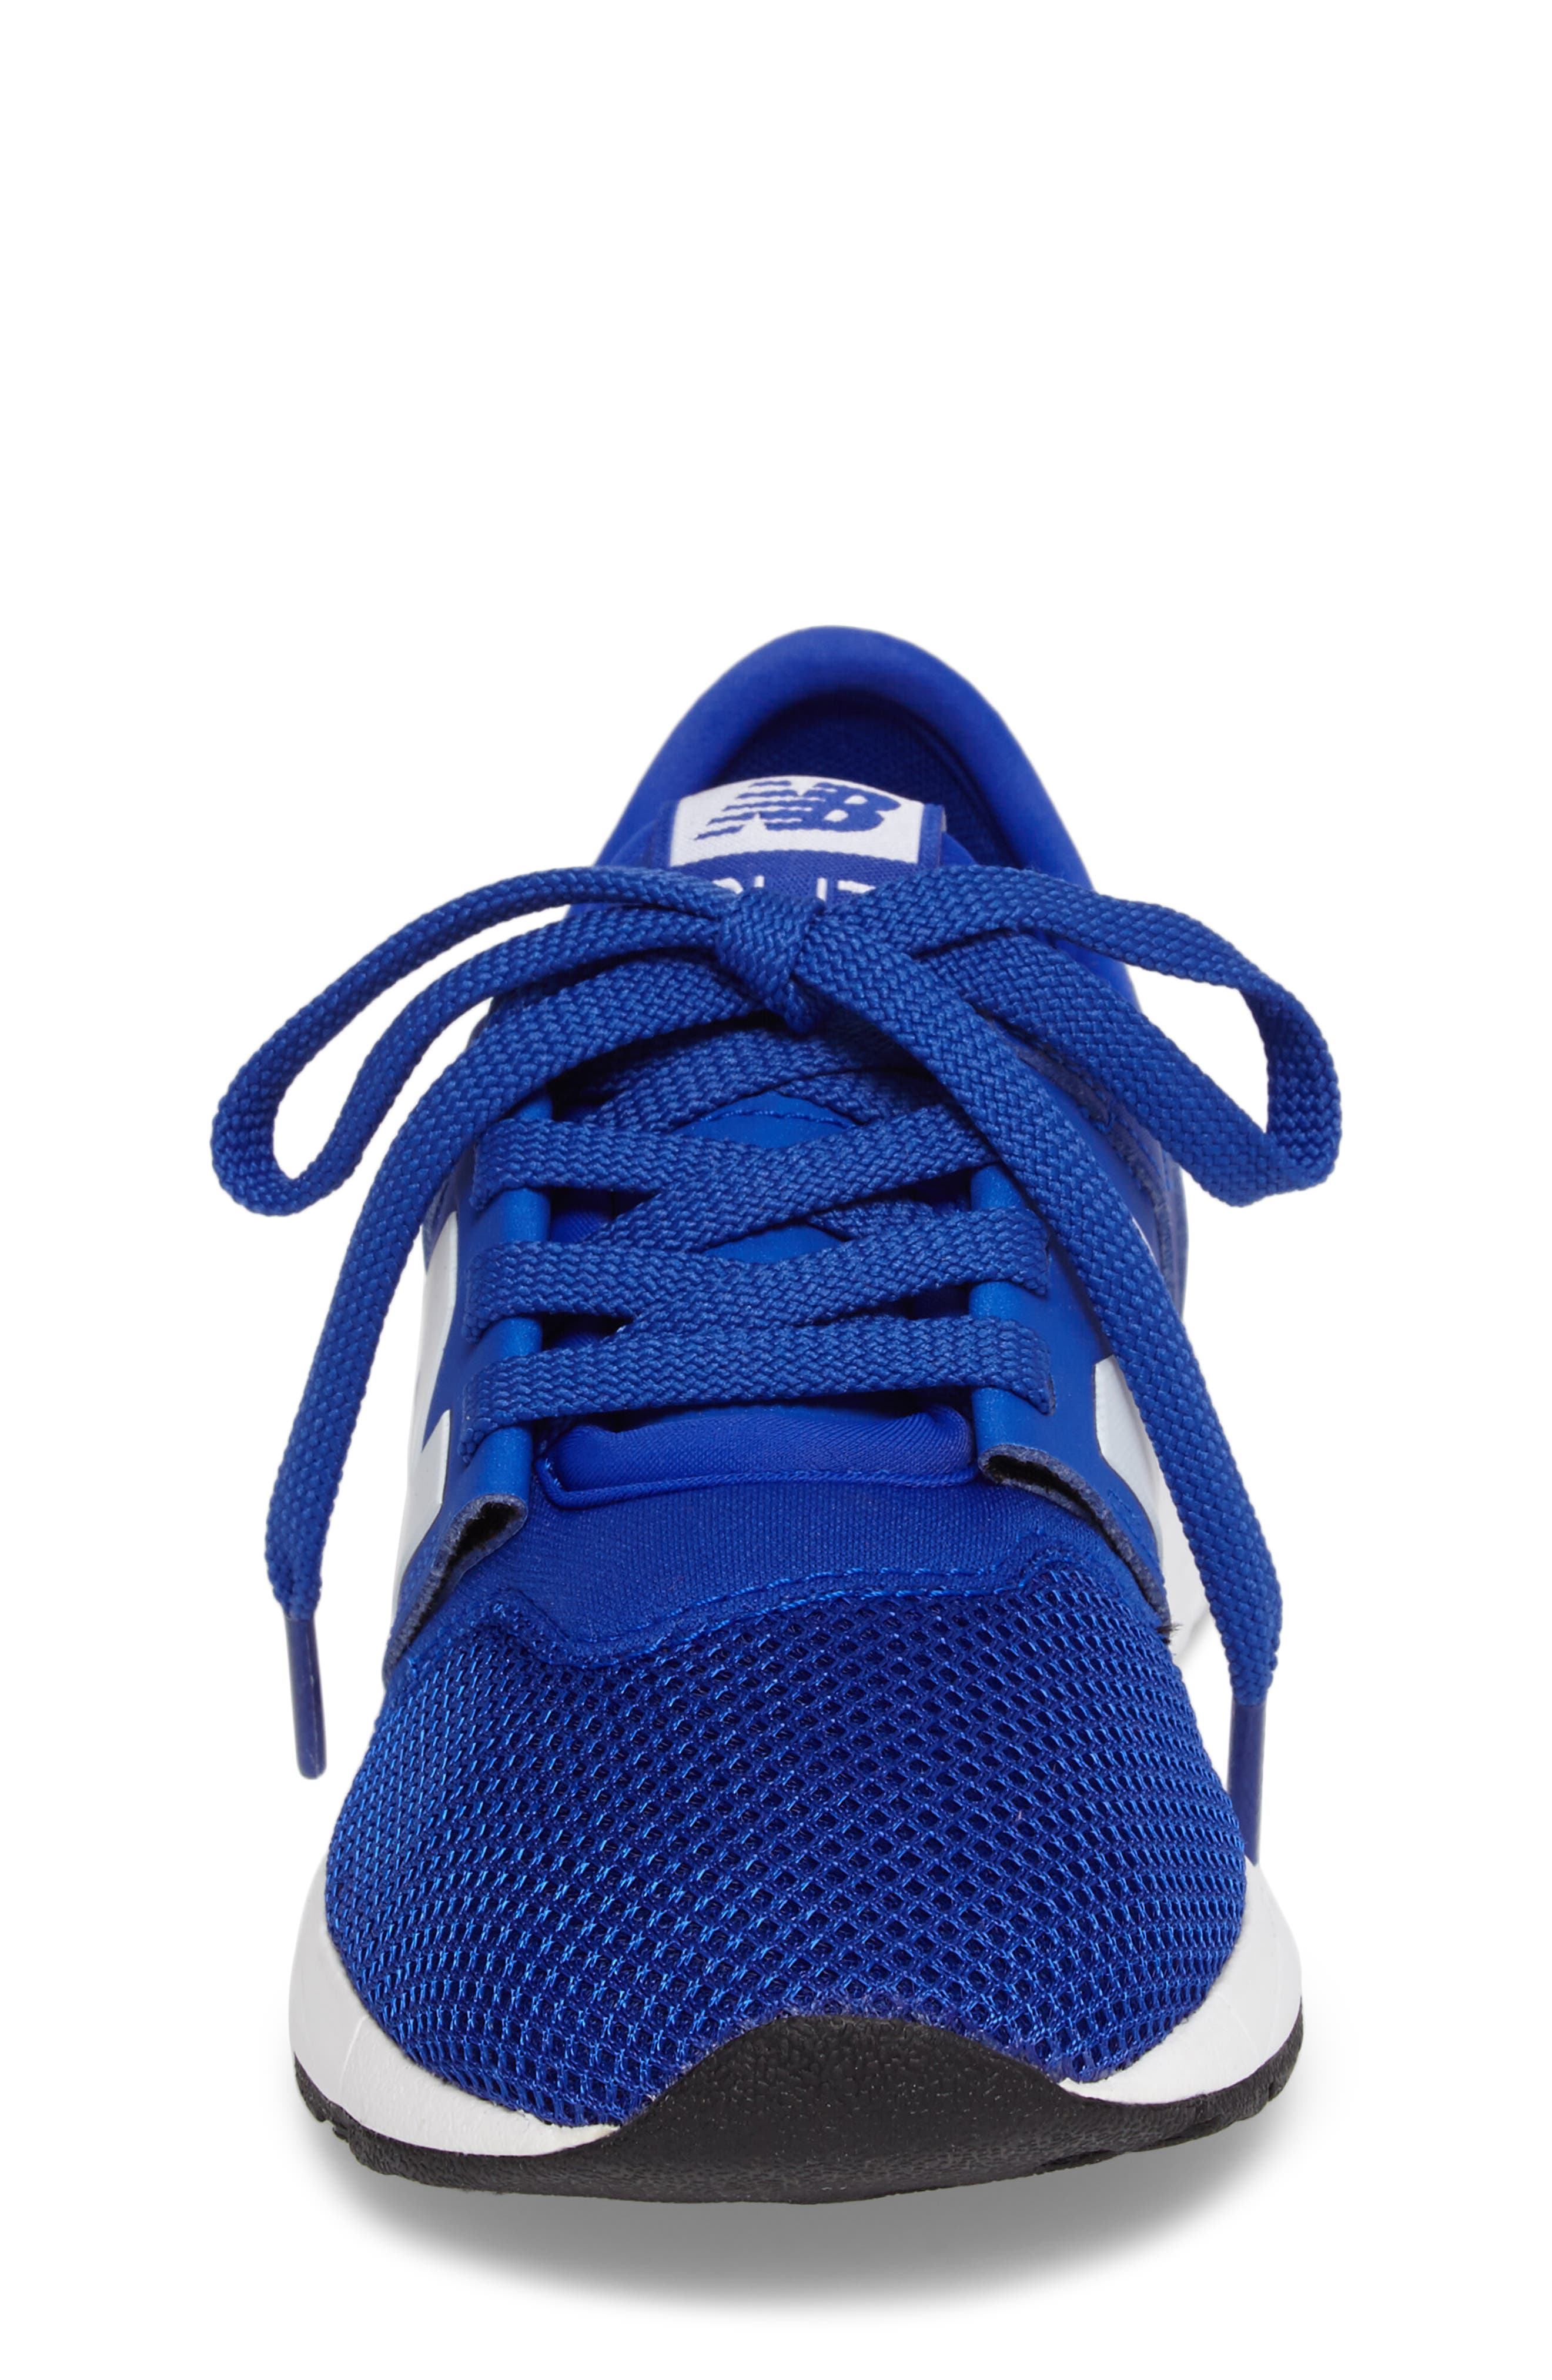 247 Core Sneaker,                             Alternate thumbnail 4, color,                             Blue/ White